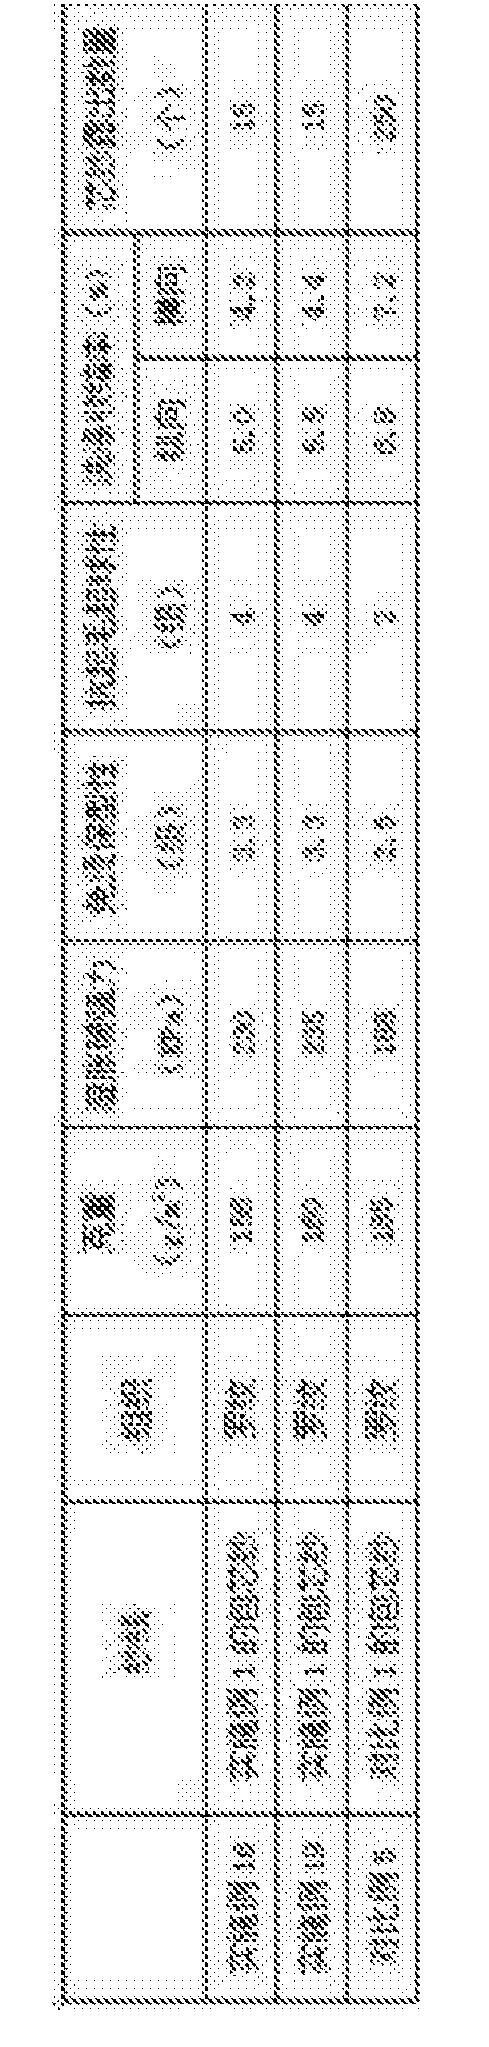 Figure CN106192117AD00131